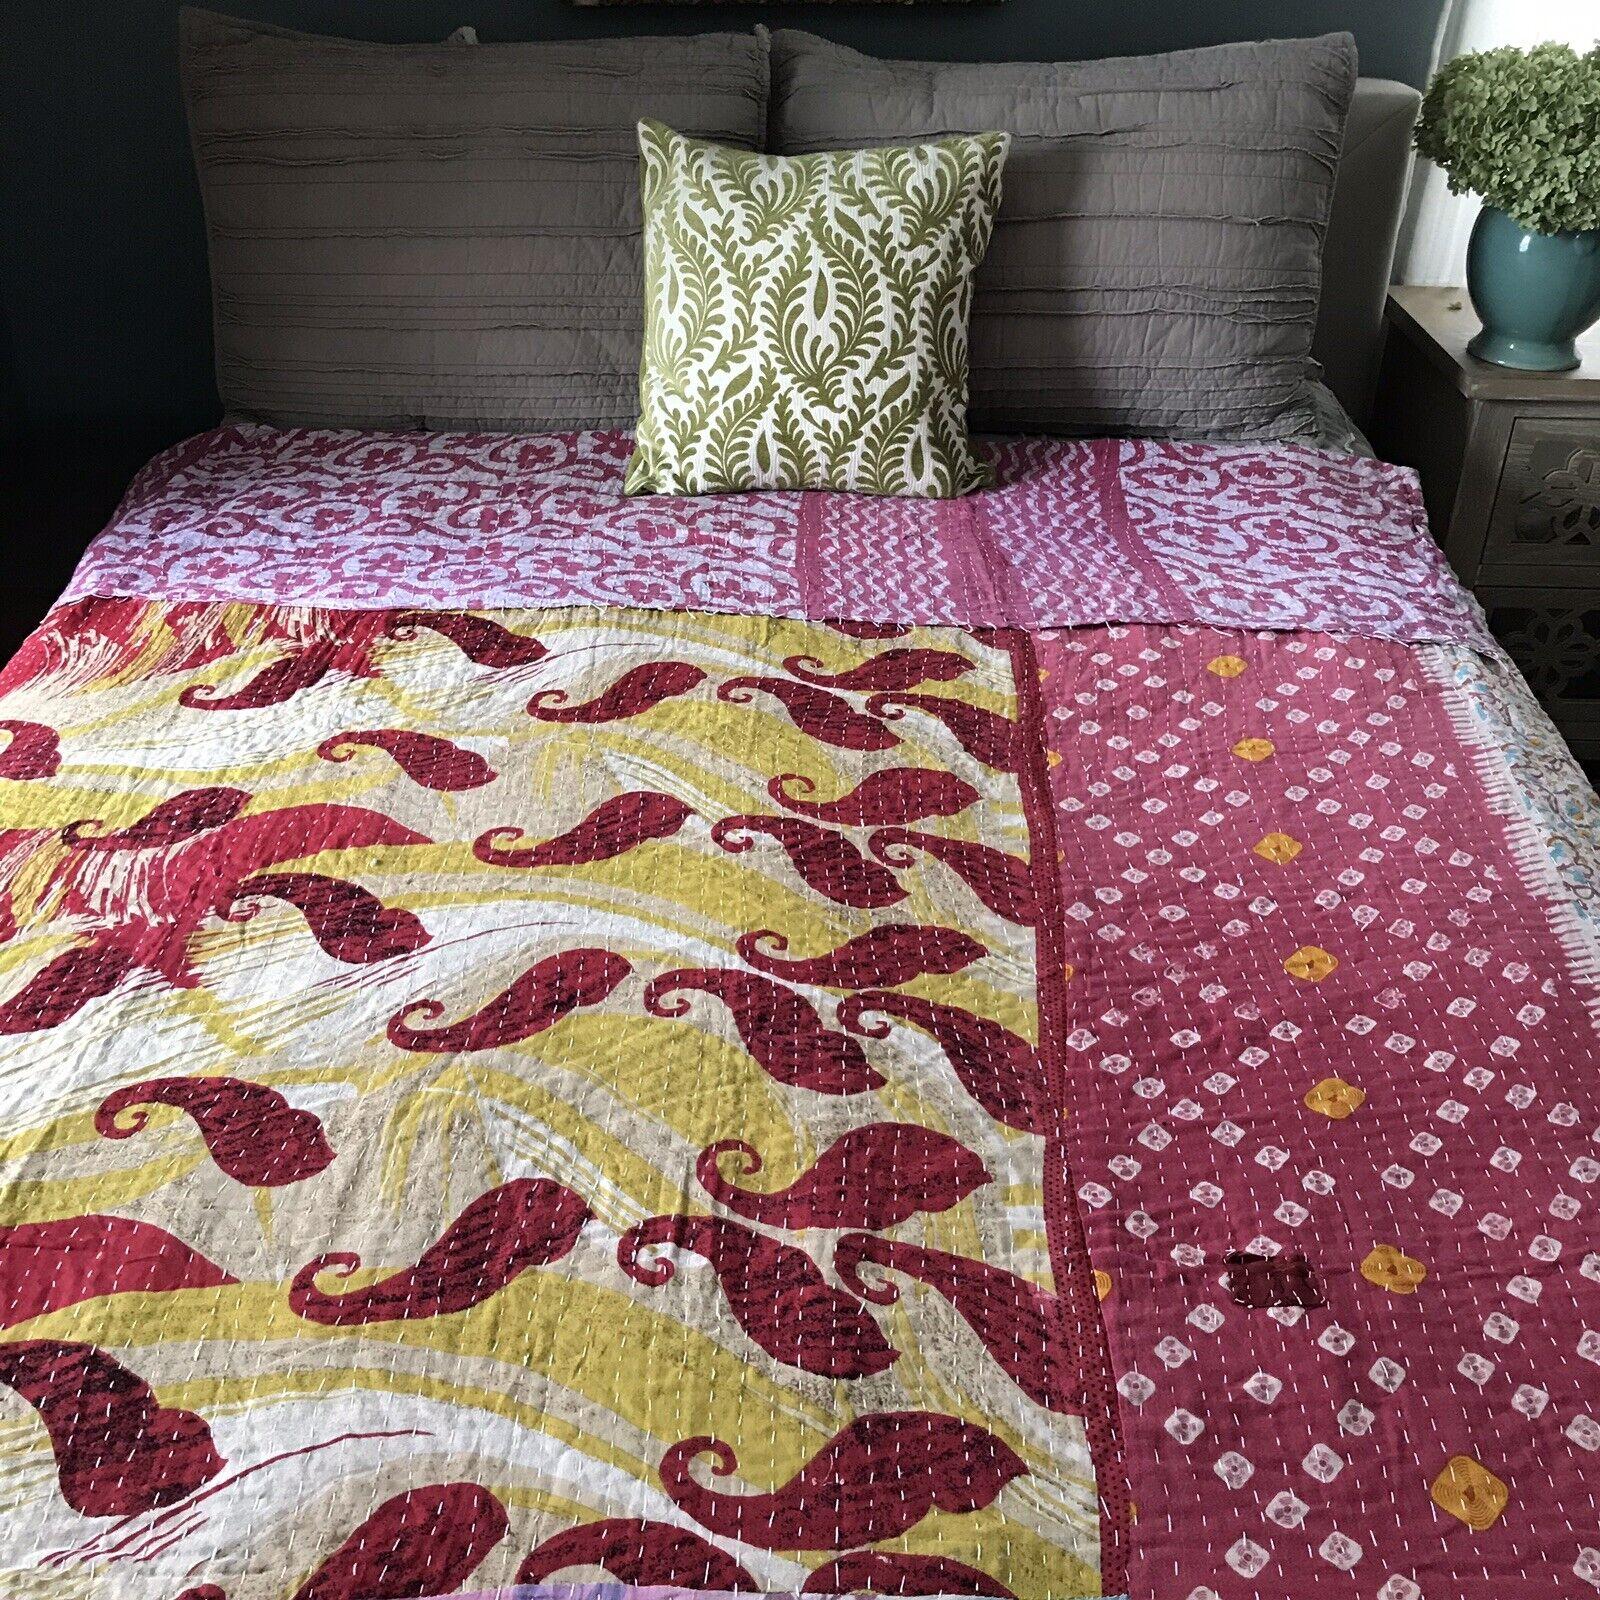 Vintage Kantha Quilt. Sundance Catalog Kantha Throw. Reversible Twin Bedspread.